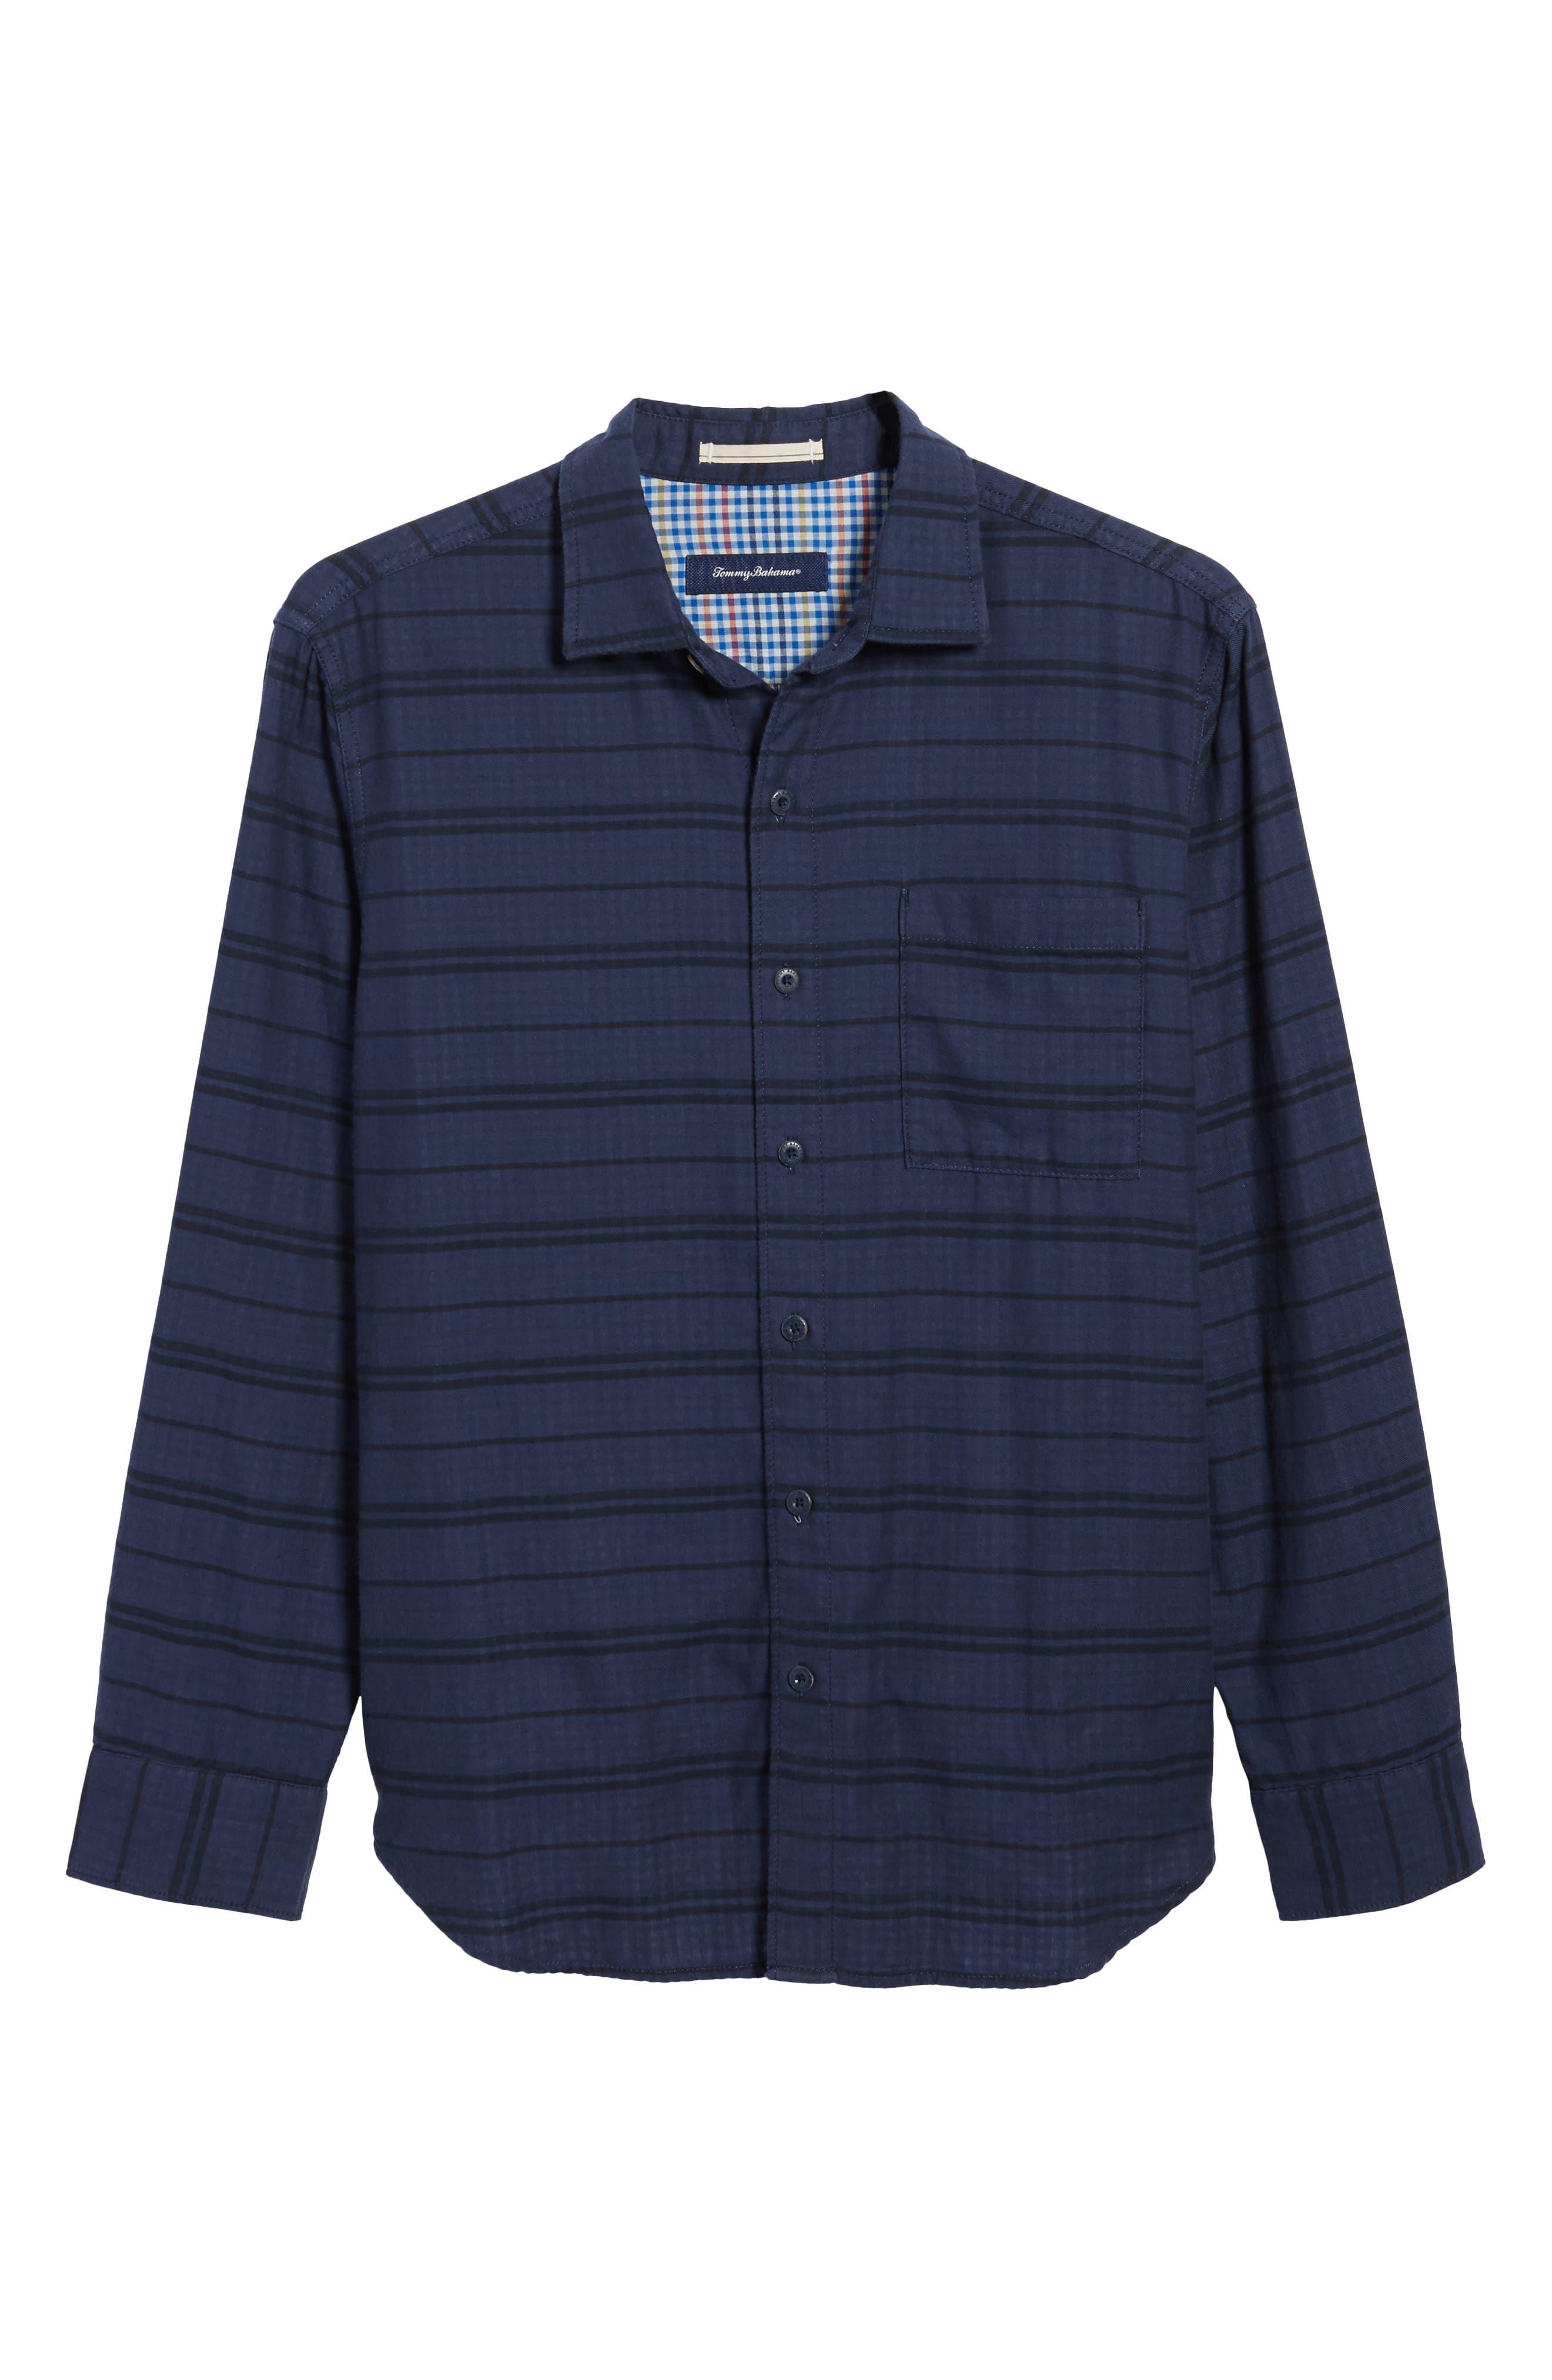 Tan Tan Stripe Standard Fit Sport Shirt,                             Alternate thumbnail 6, color,                             Deep Tahoe